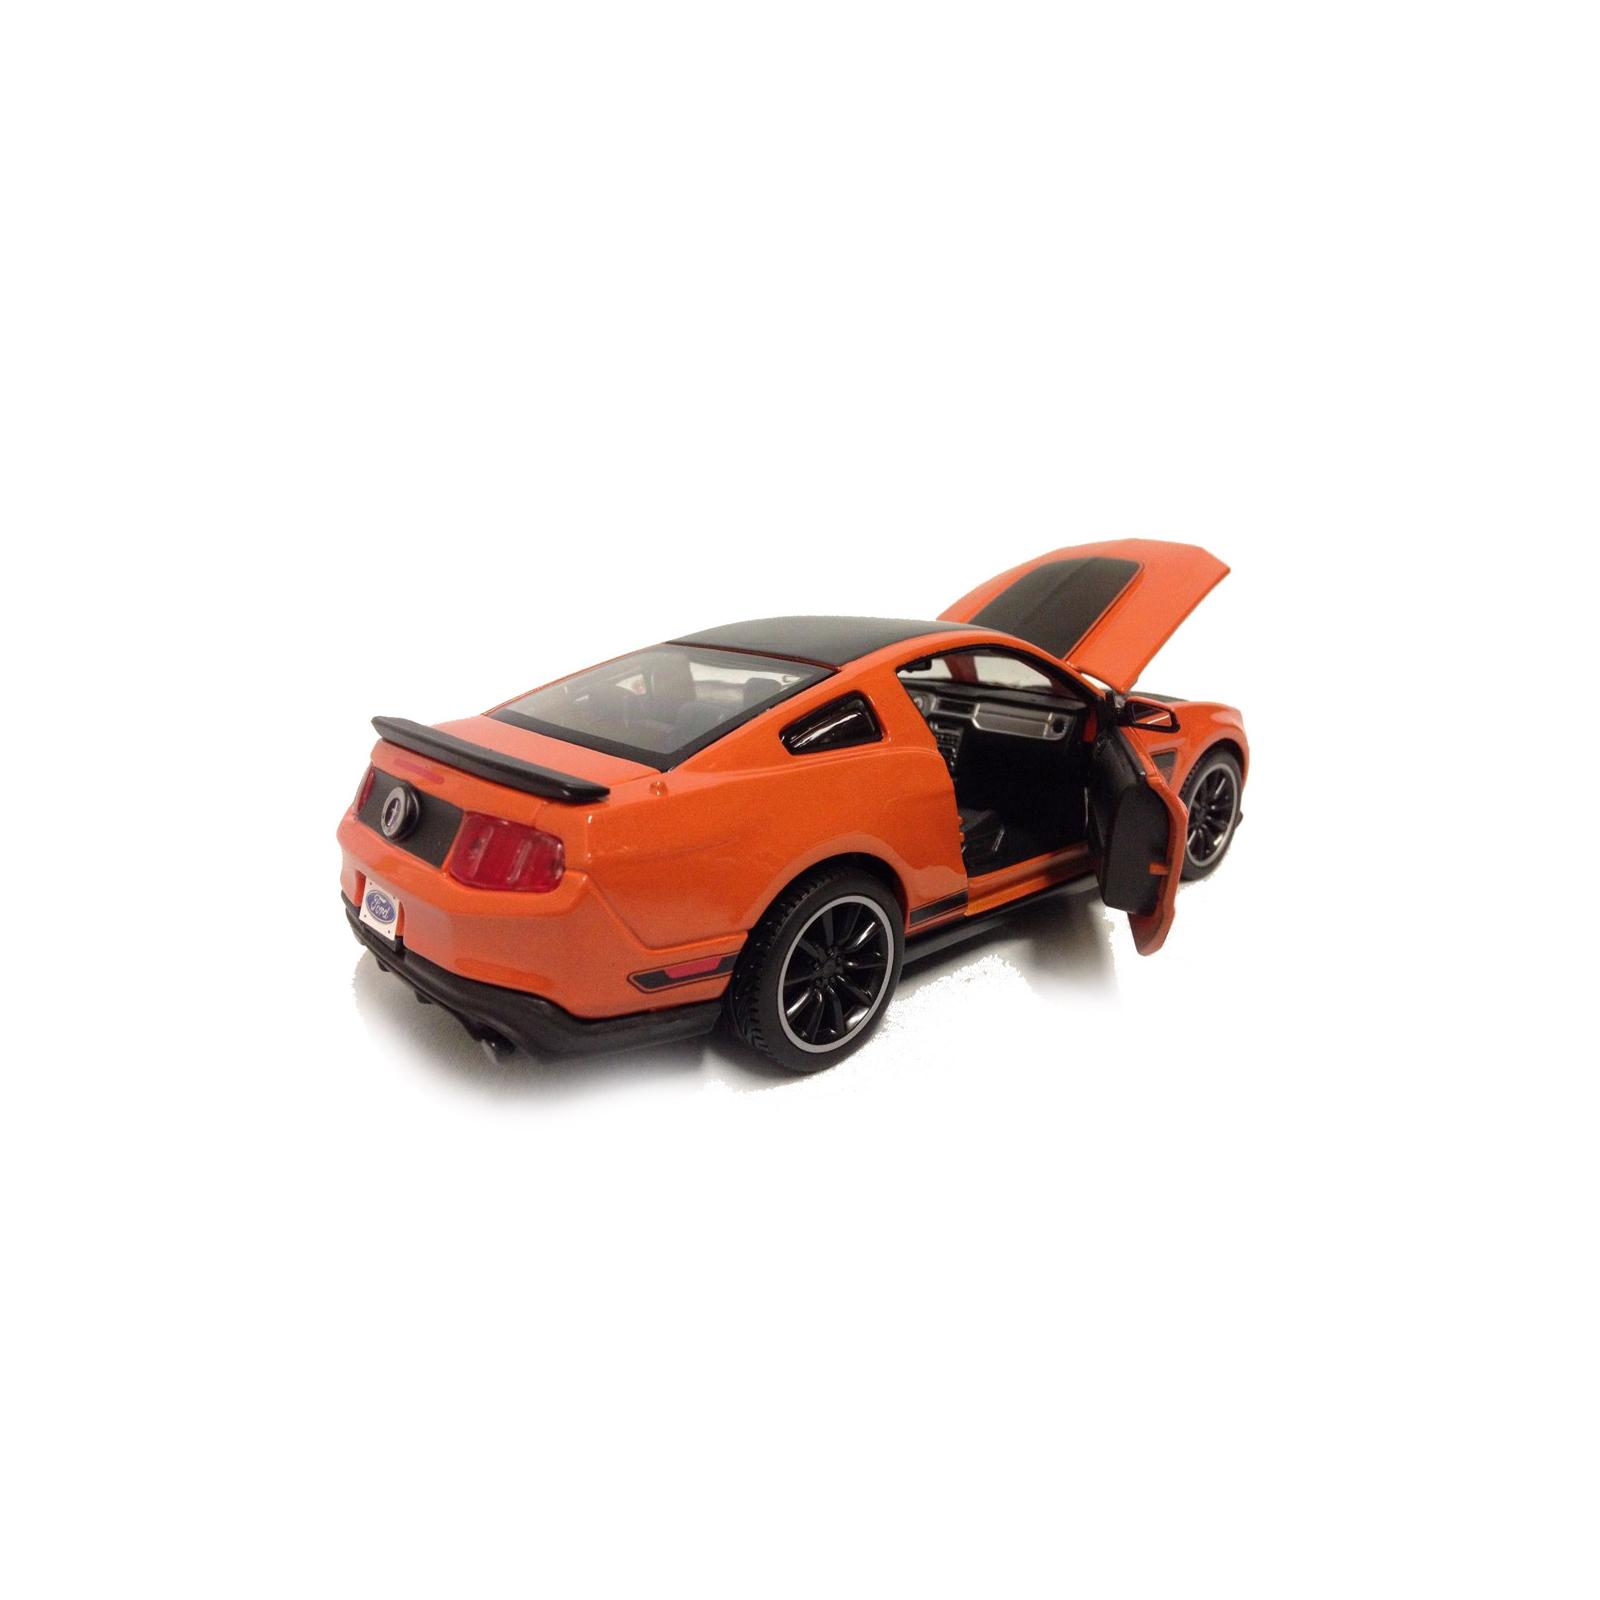 Машина Maisto Ford Mustang Boss 302 (1:24) оражевый (31269 orange) изображение 5